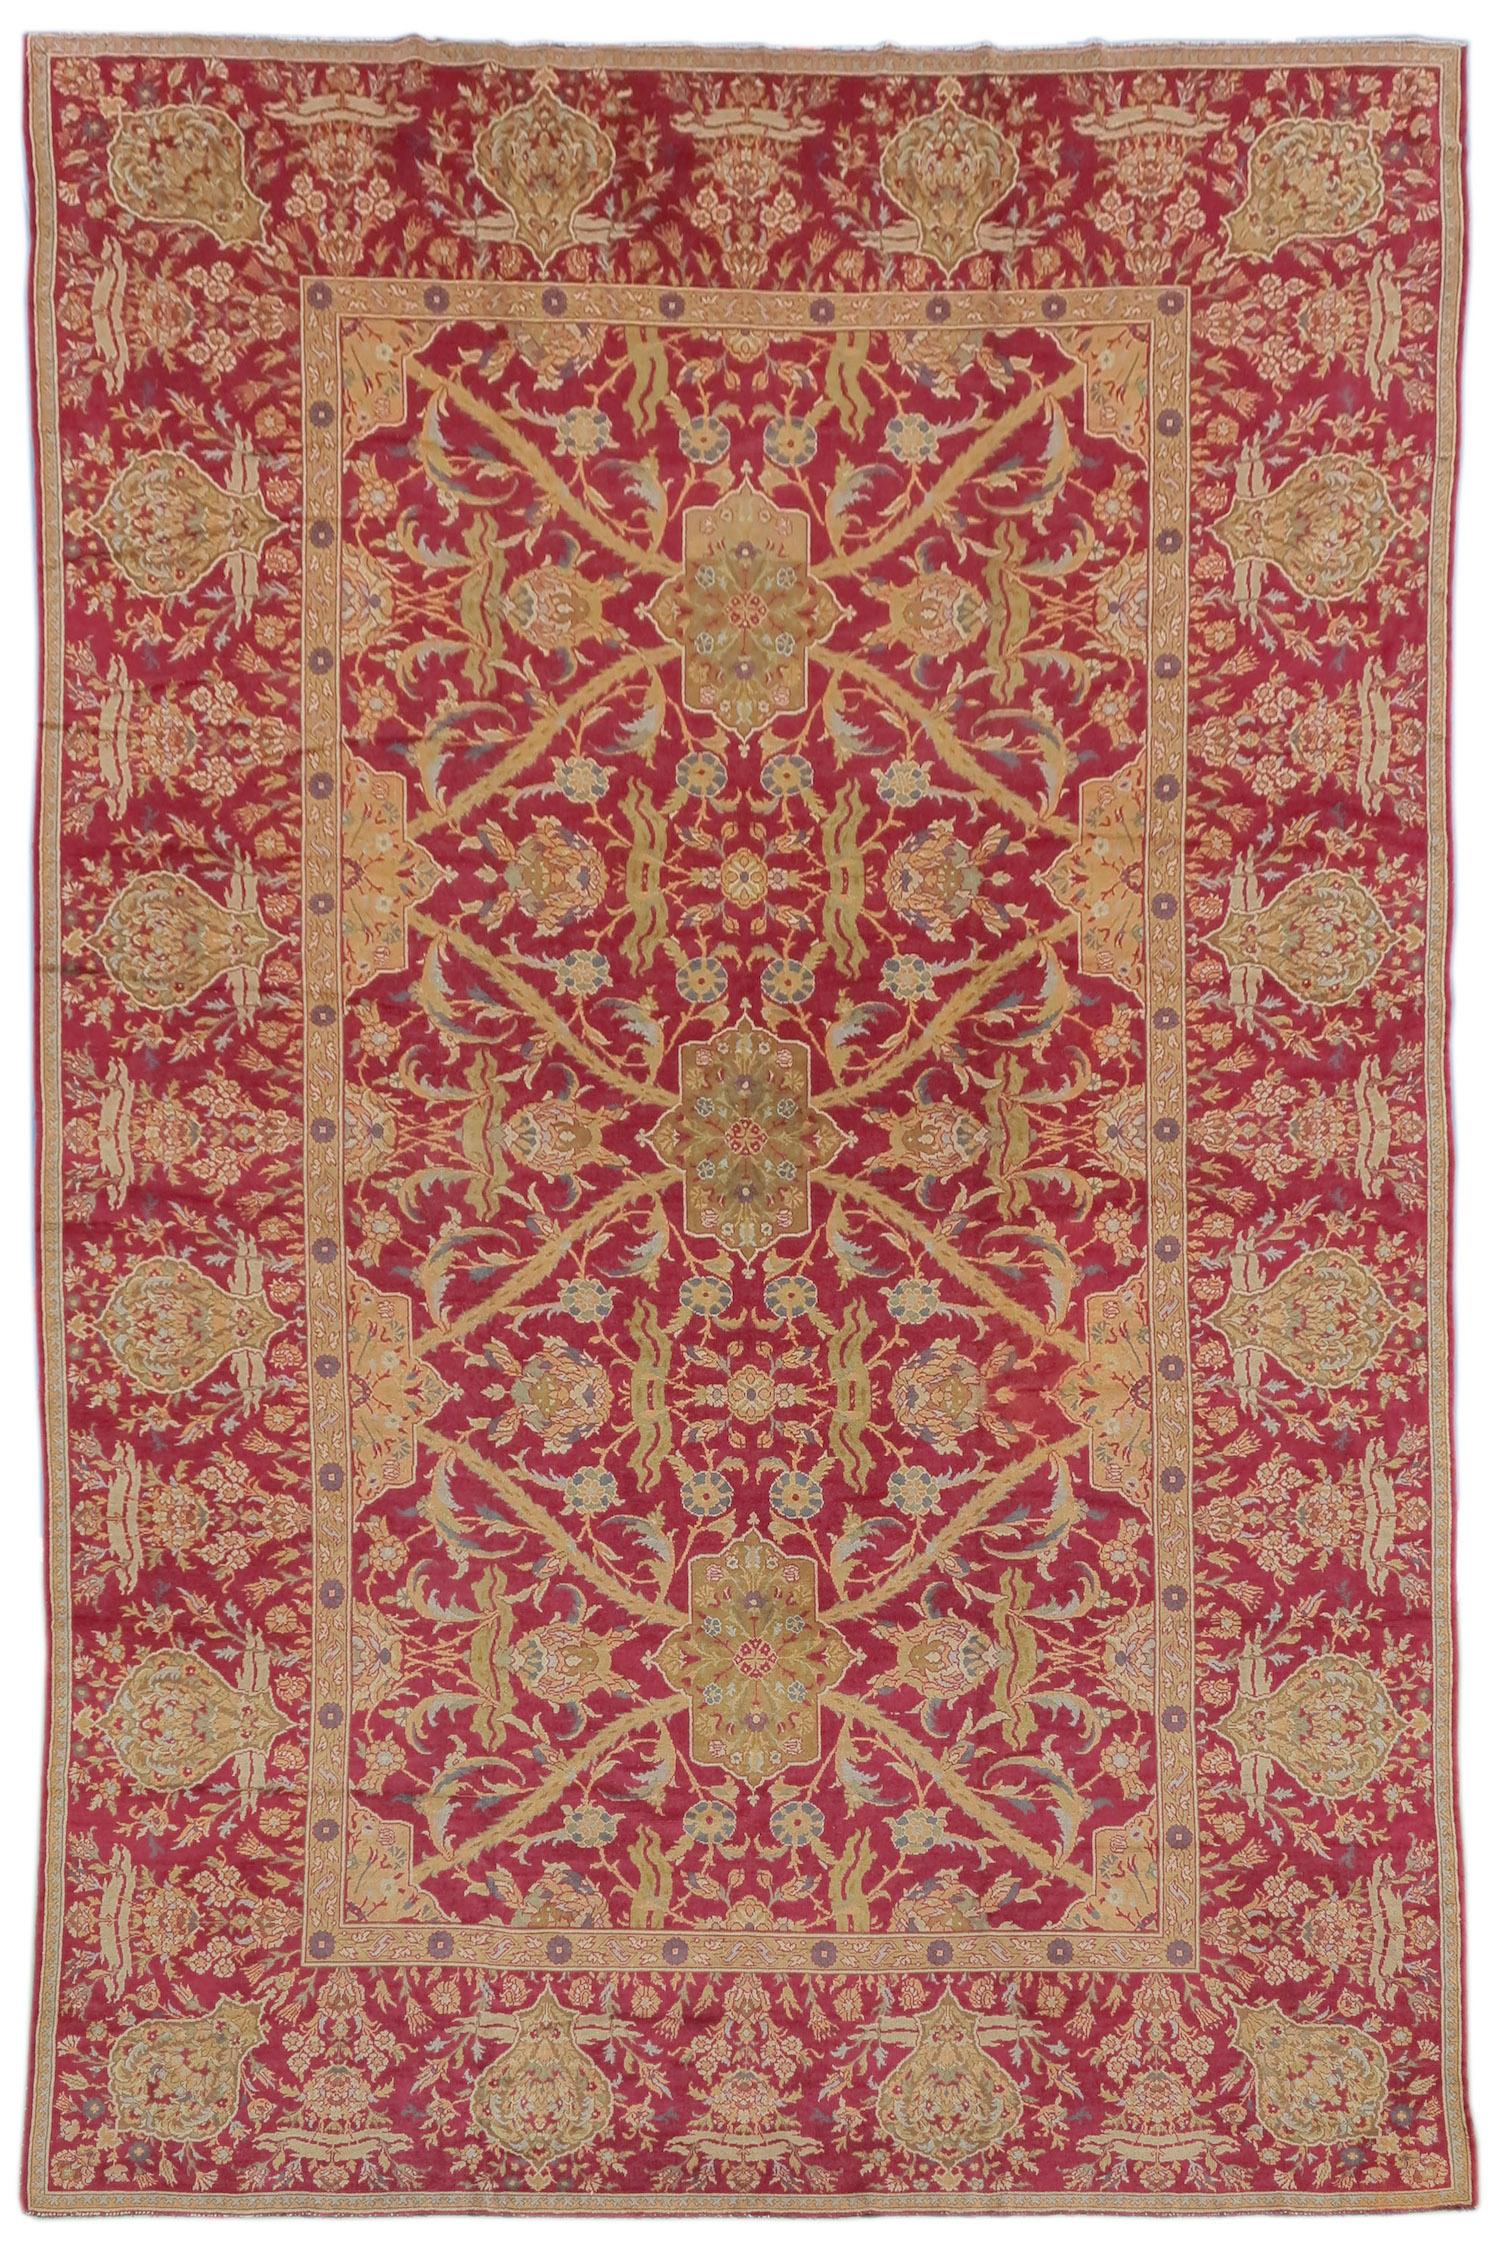 Ottoman style carpet